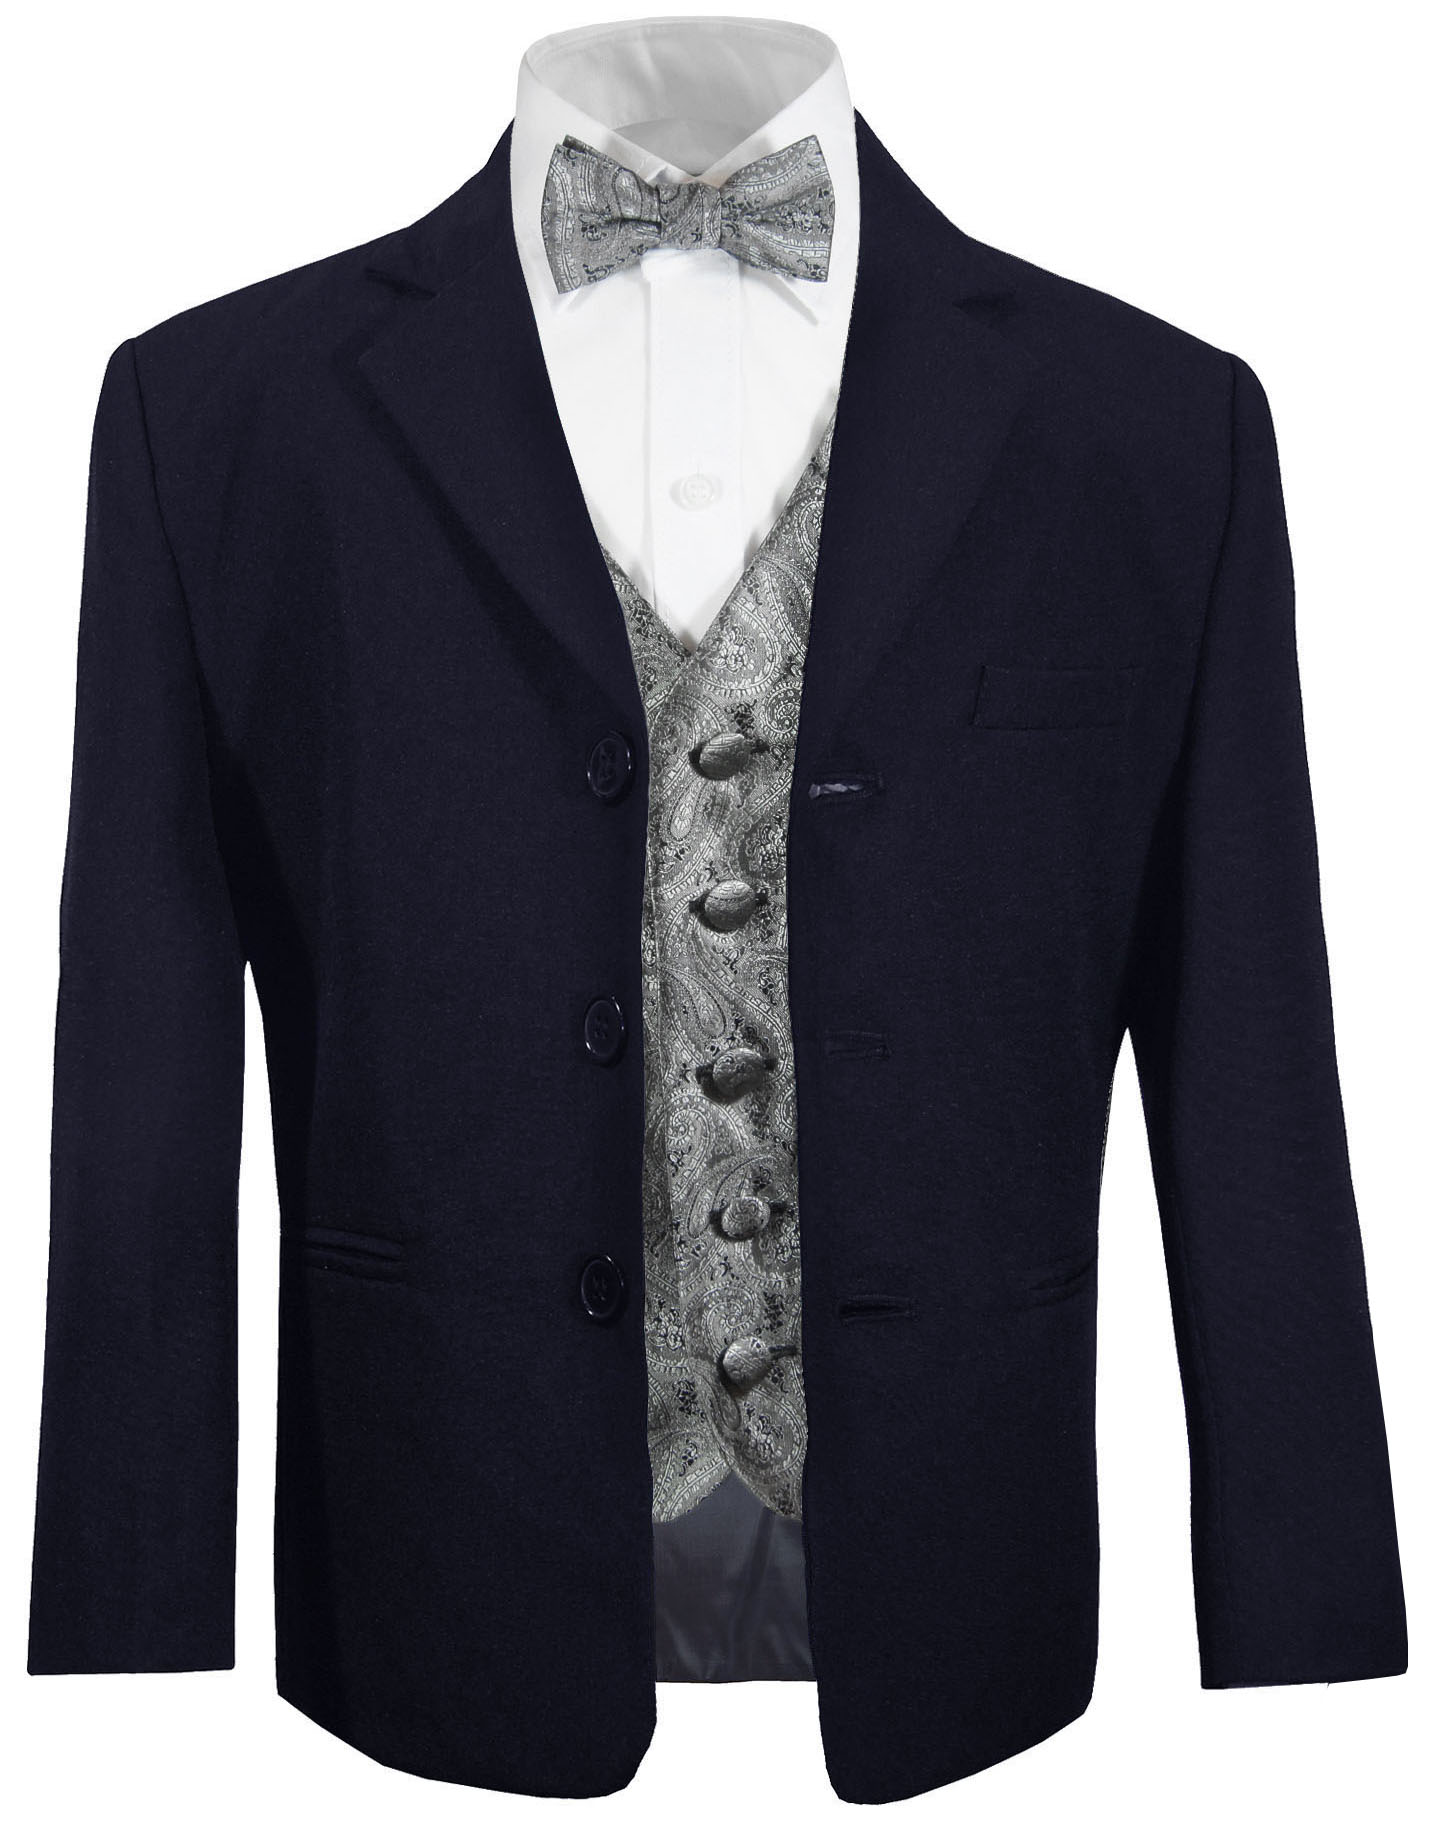 kinderanzug blau graue weste fliege paul malone shop. Black Bedroom Furniture Sets. Home Design Ideas